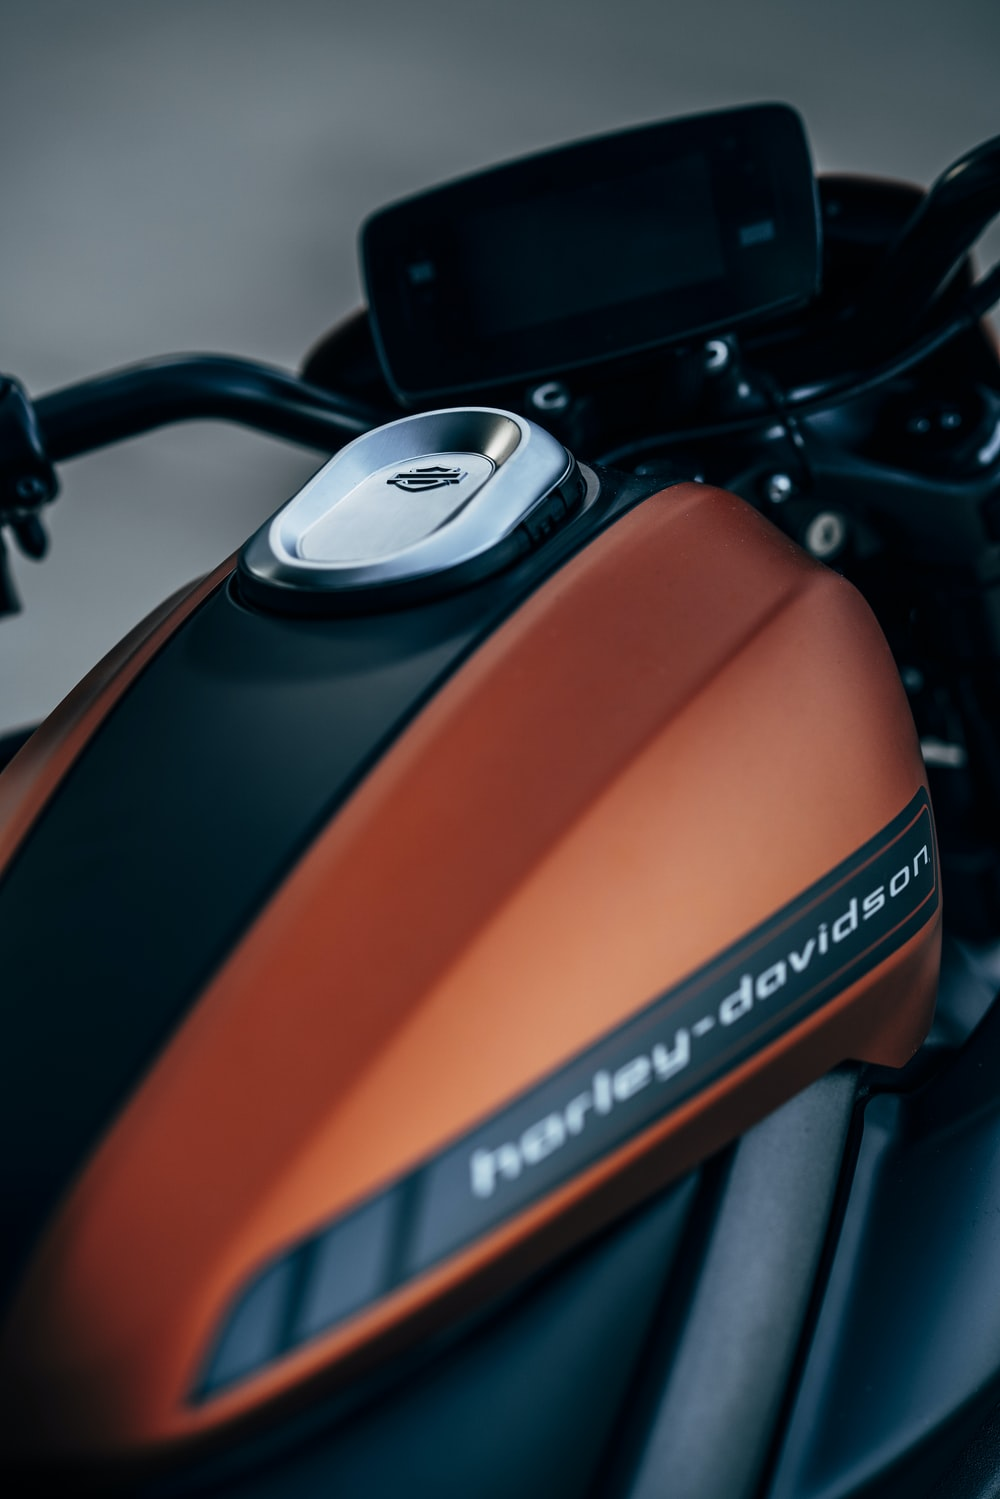 orange and black Harley-Davidson backbone motorcycle